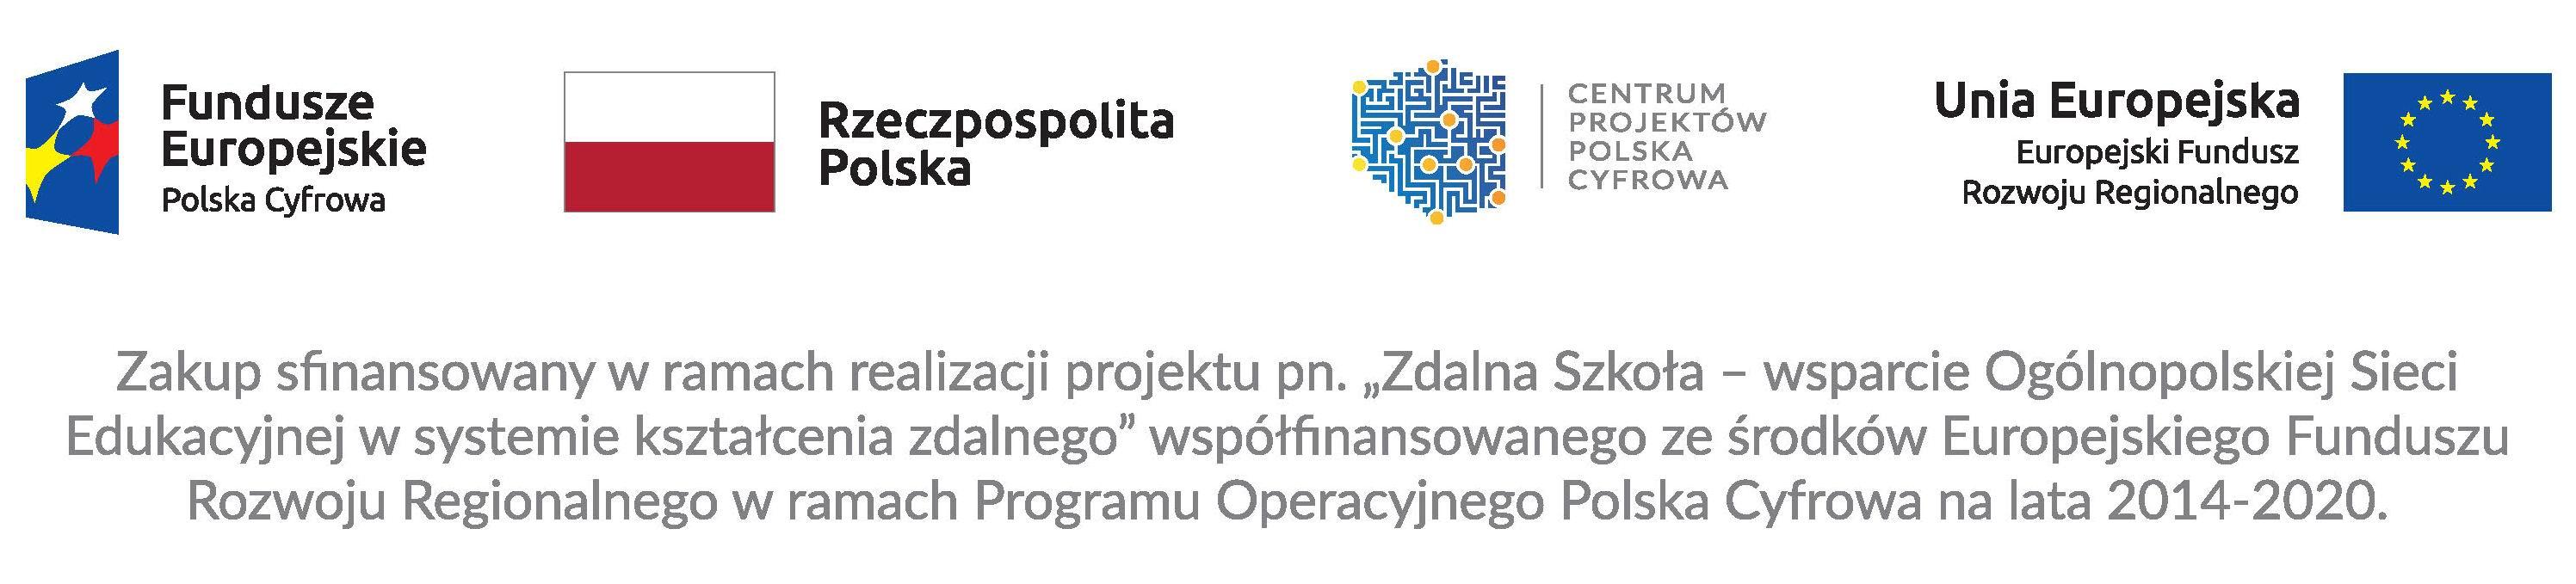 logosy programu